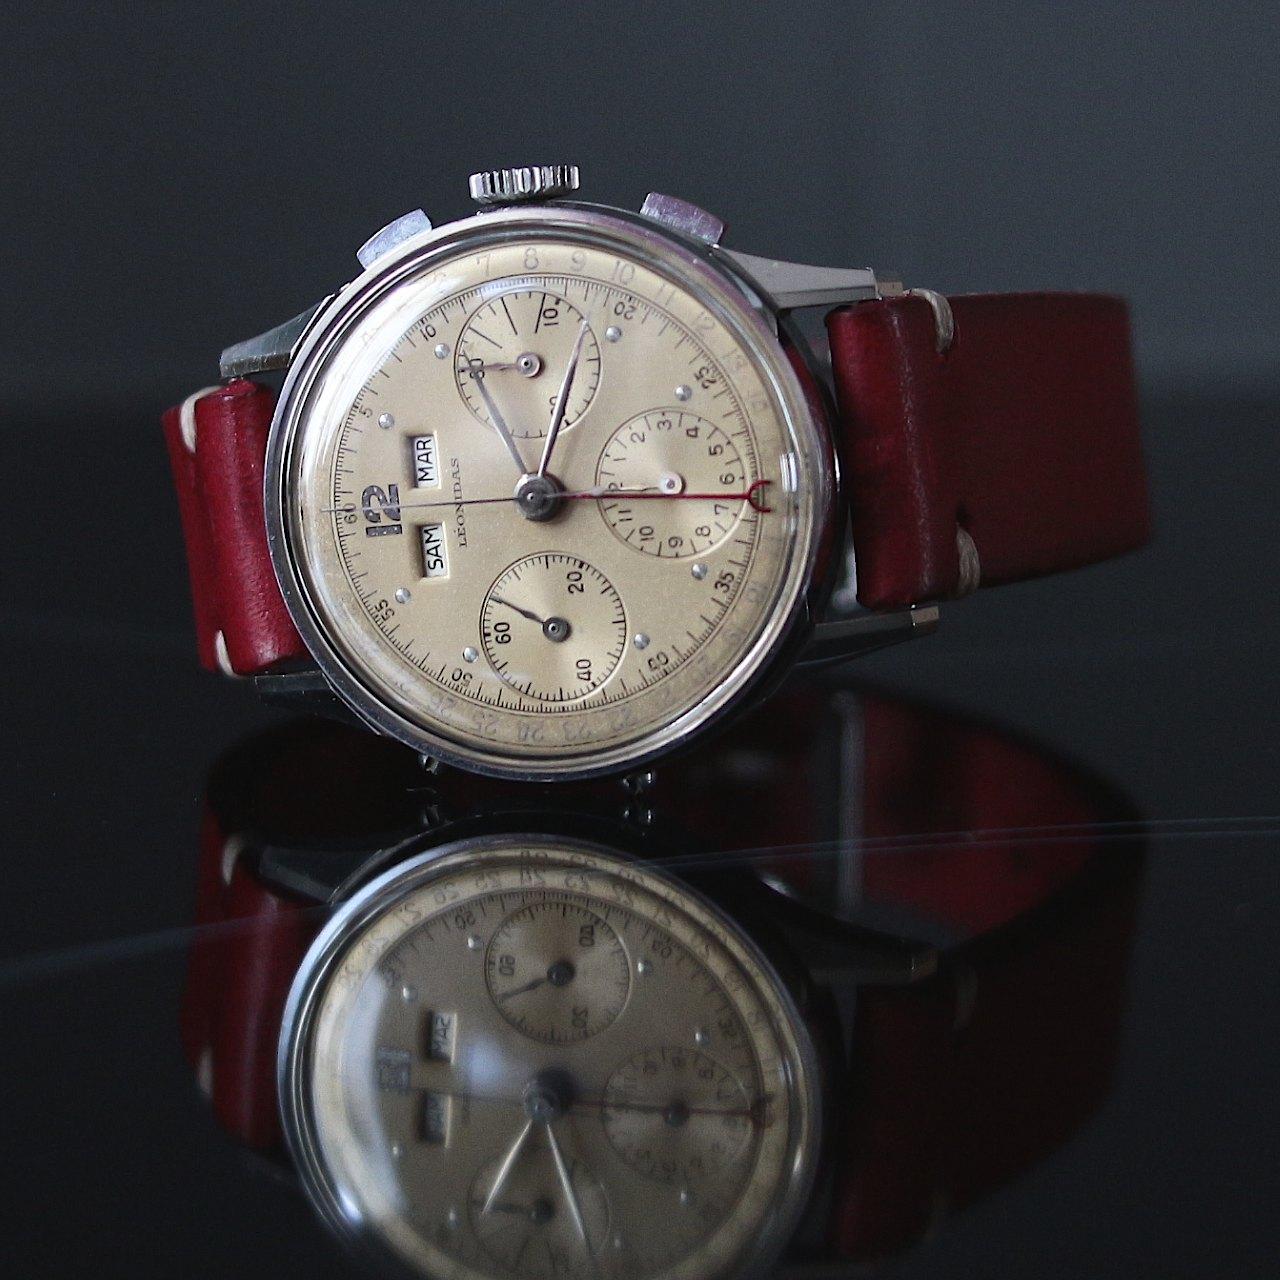 LEONIDAS, chronographe Datora, Valjoux 72C, vers 1955.